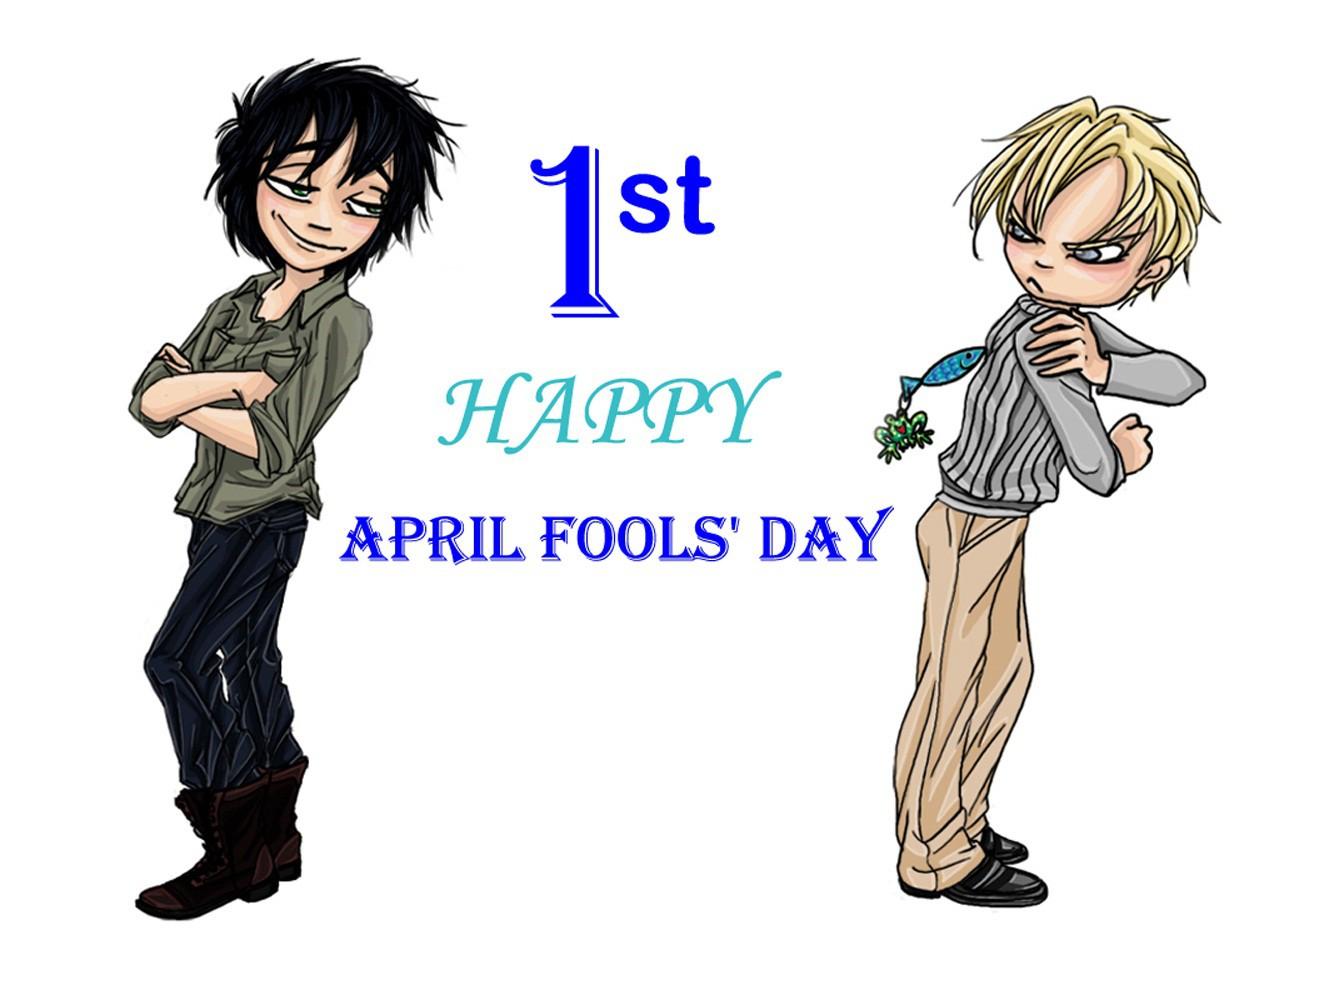 April Fools Images GIF Pictures Funny Meme 1st April 2020 WhatsApp 1334x1000